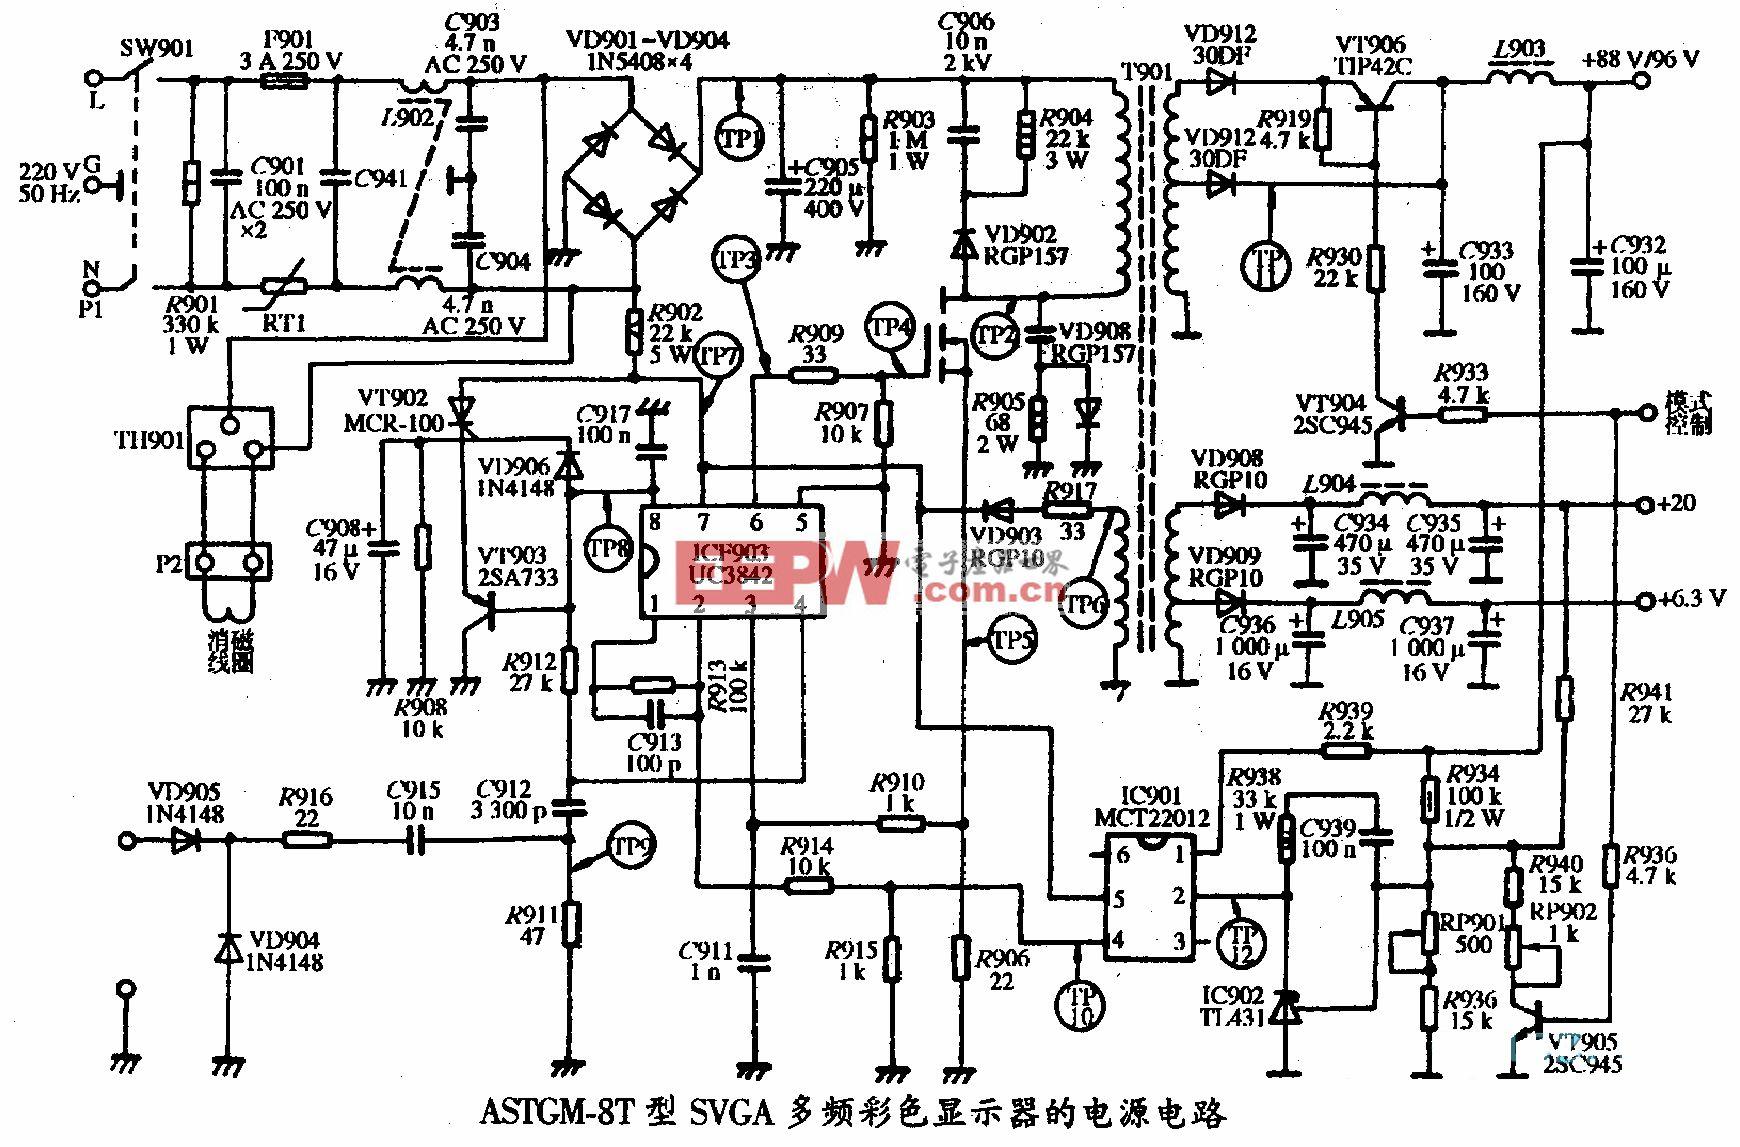 AST GM-8T型SVGA彩色显示器的电源电路图